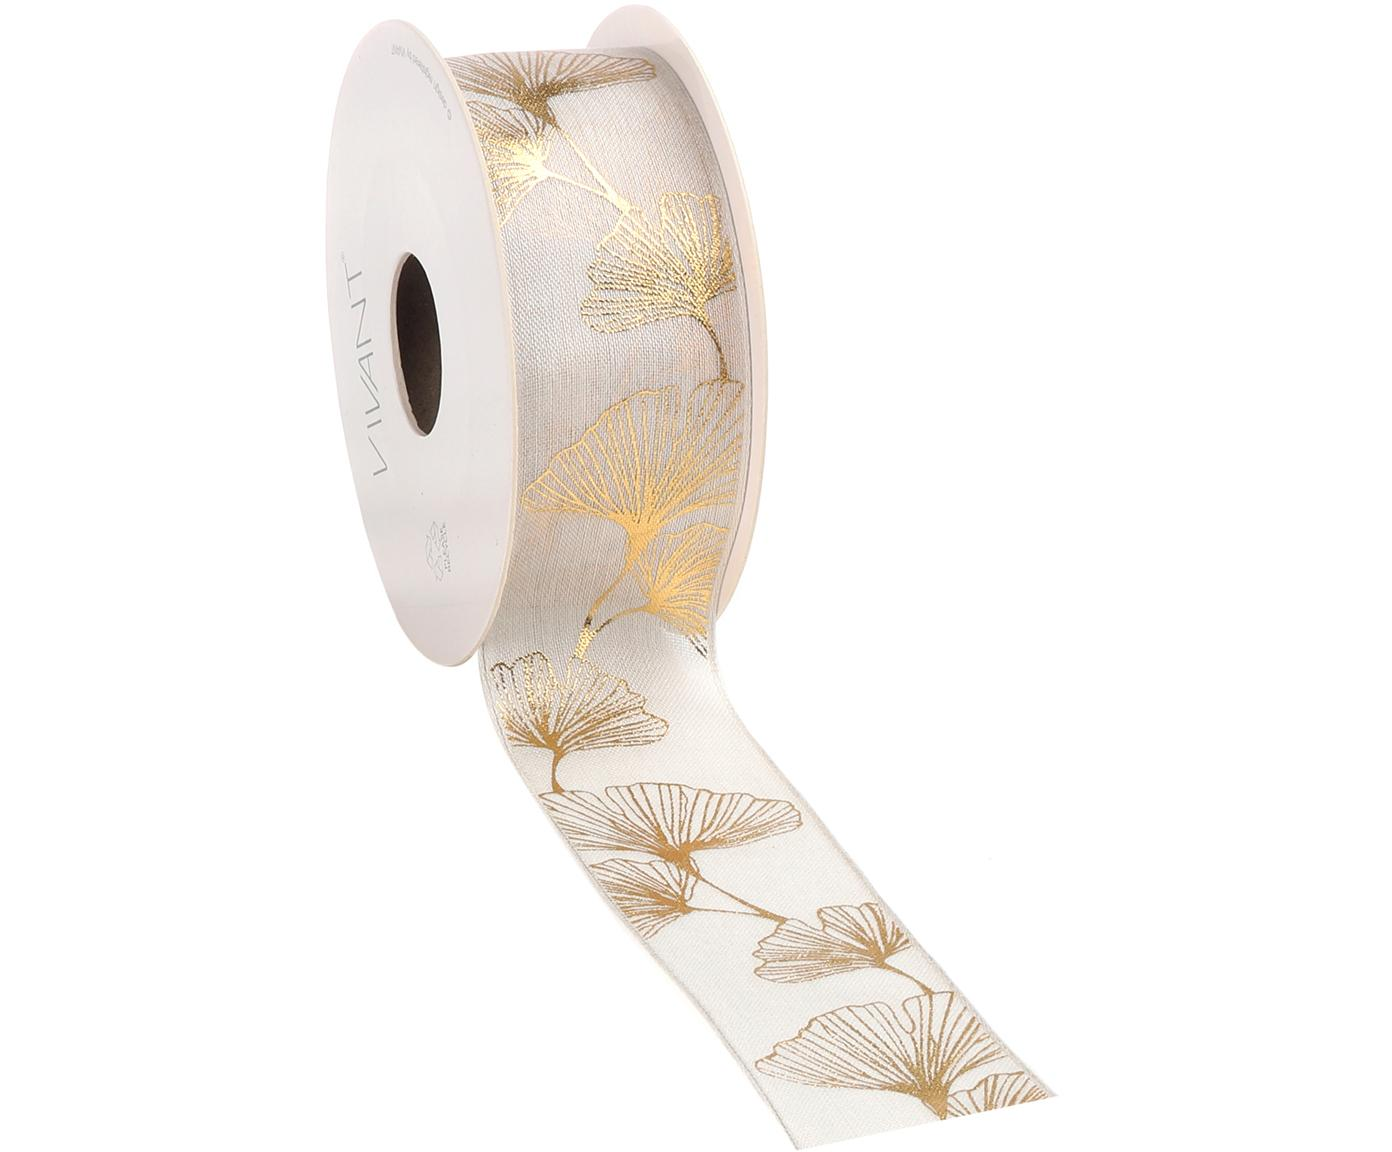 Cadeaulint Gingko, 60% rayon, 35% polyester, 5% draad, Wit, goudkleurig, 4 x 1000 cm